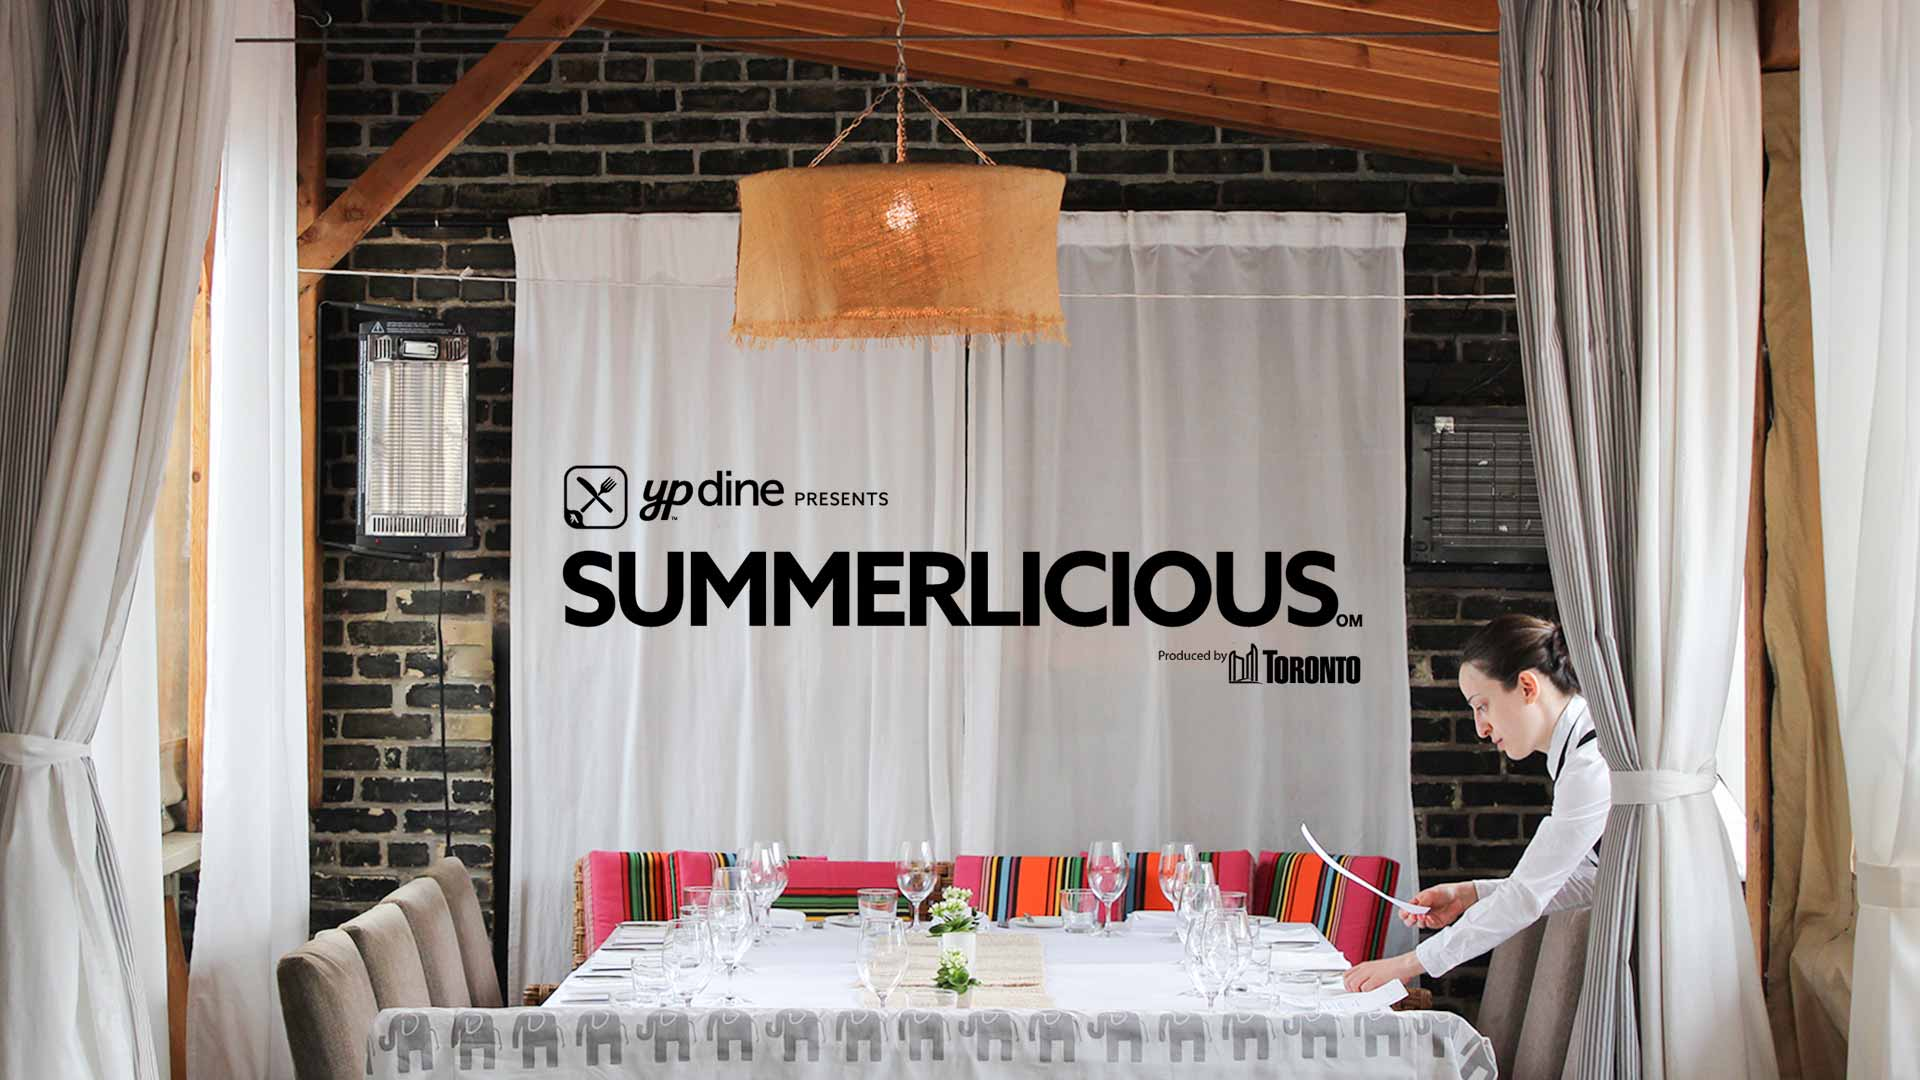 Summerlicious Toronto Best Rooftop Patio Restaurant